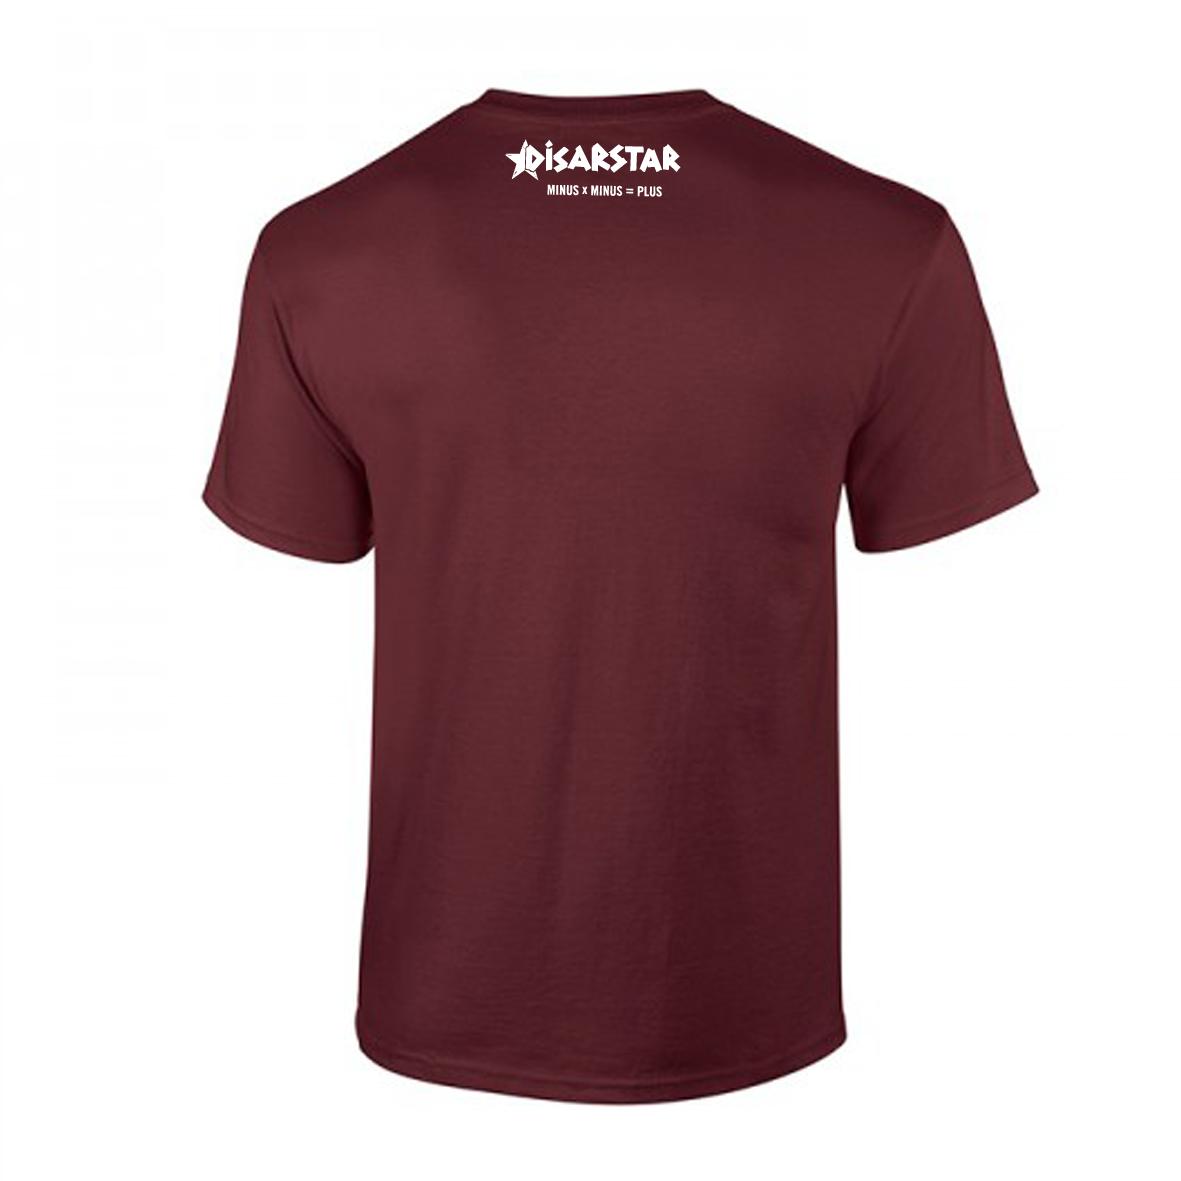 Disarstar Halb so wild T-Shirt bordeaux